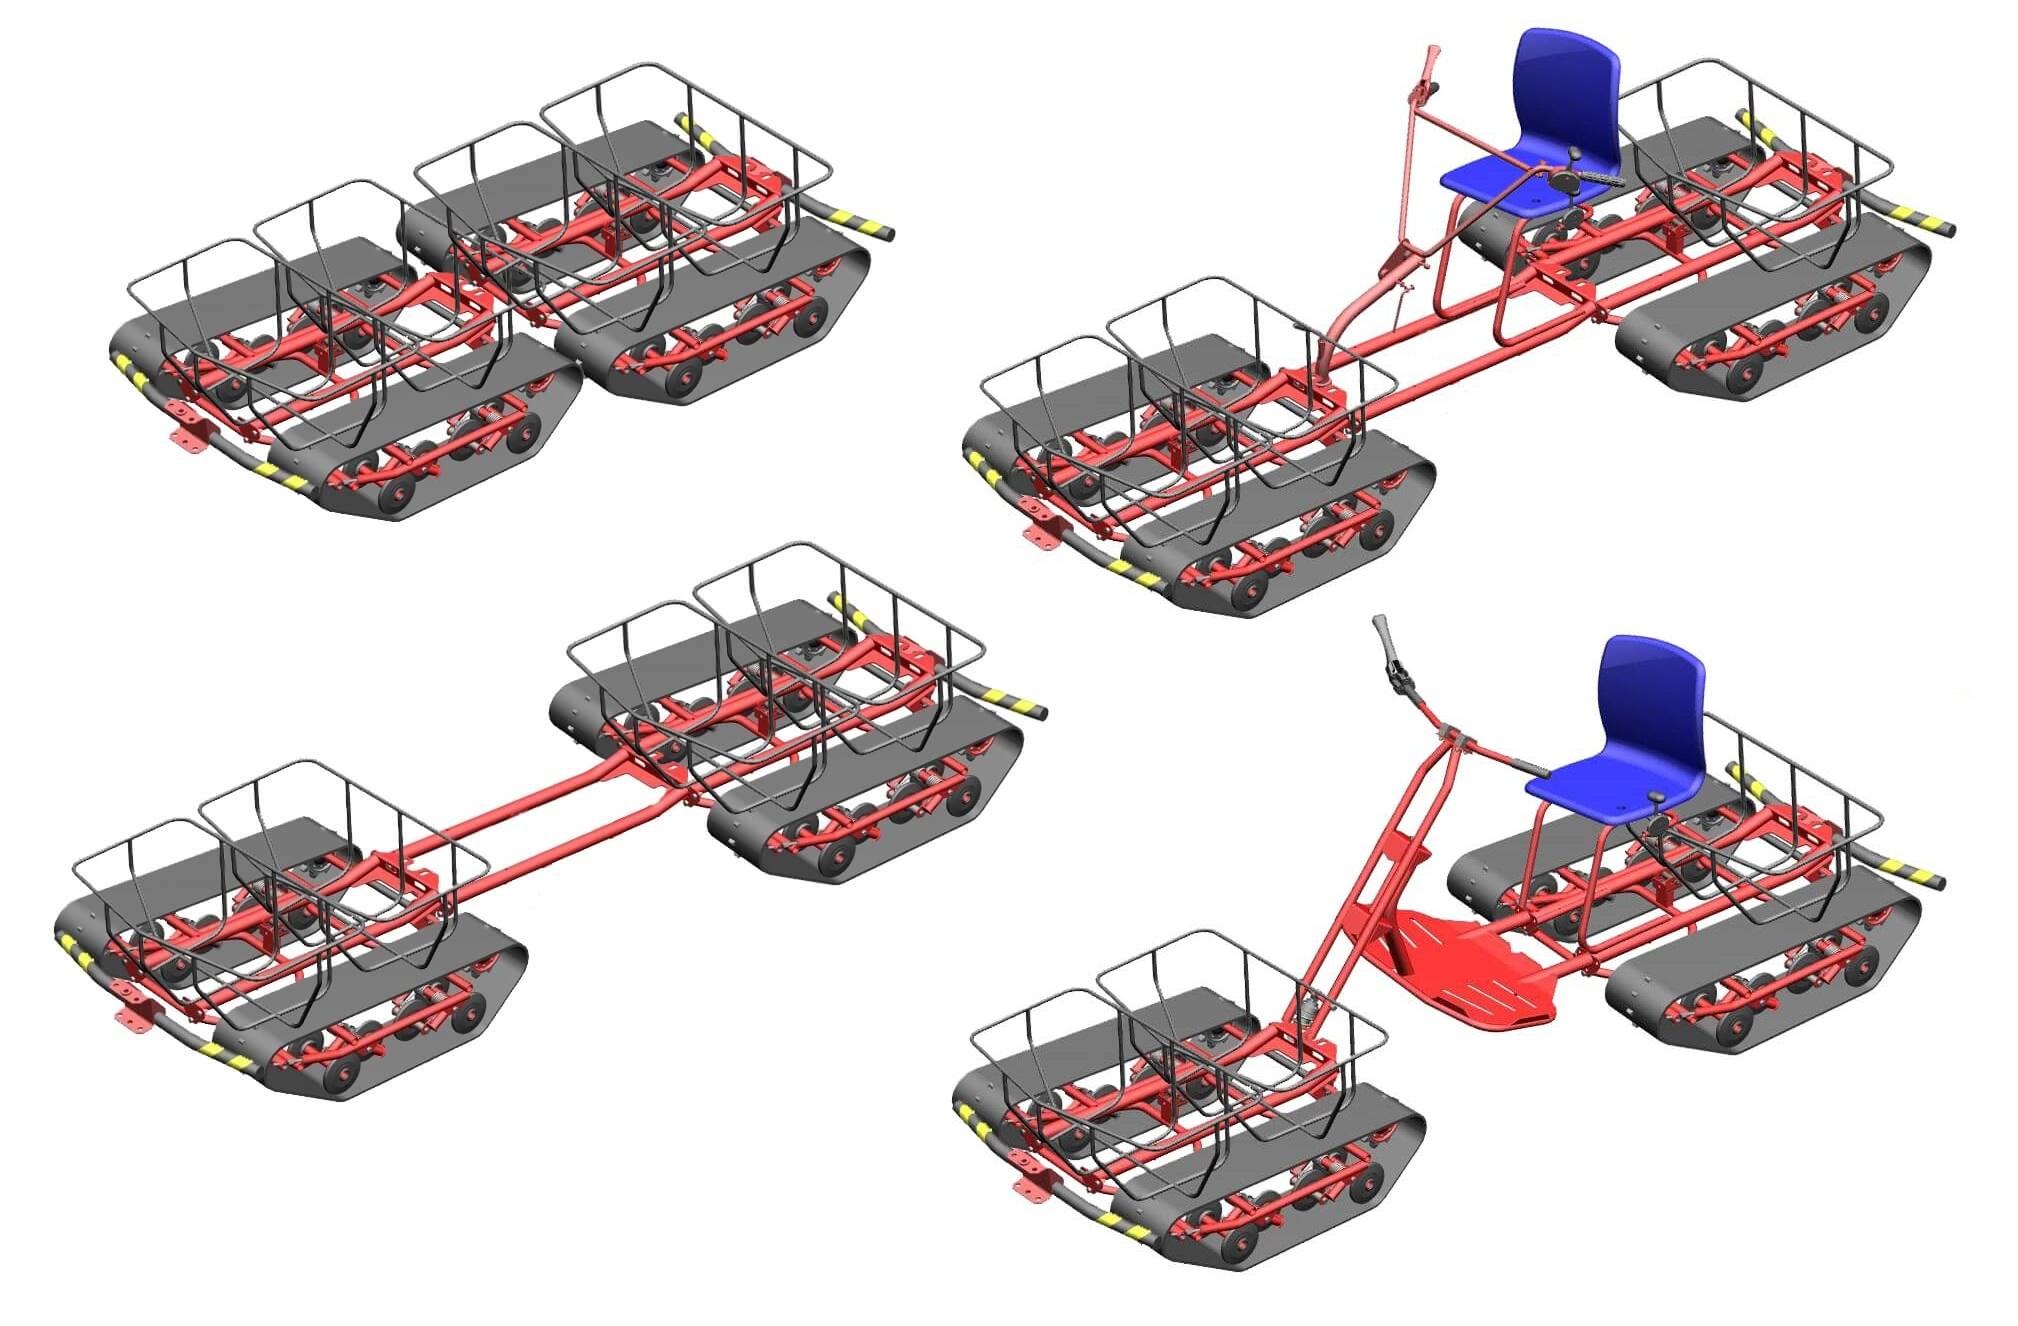 Modular snowmobile_x2_18